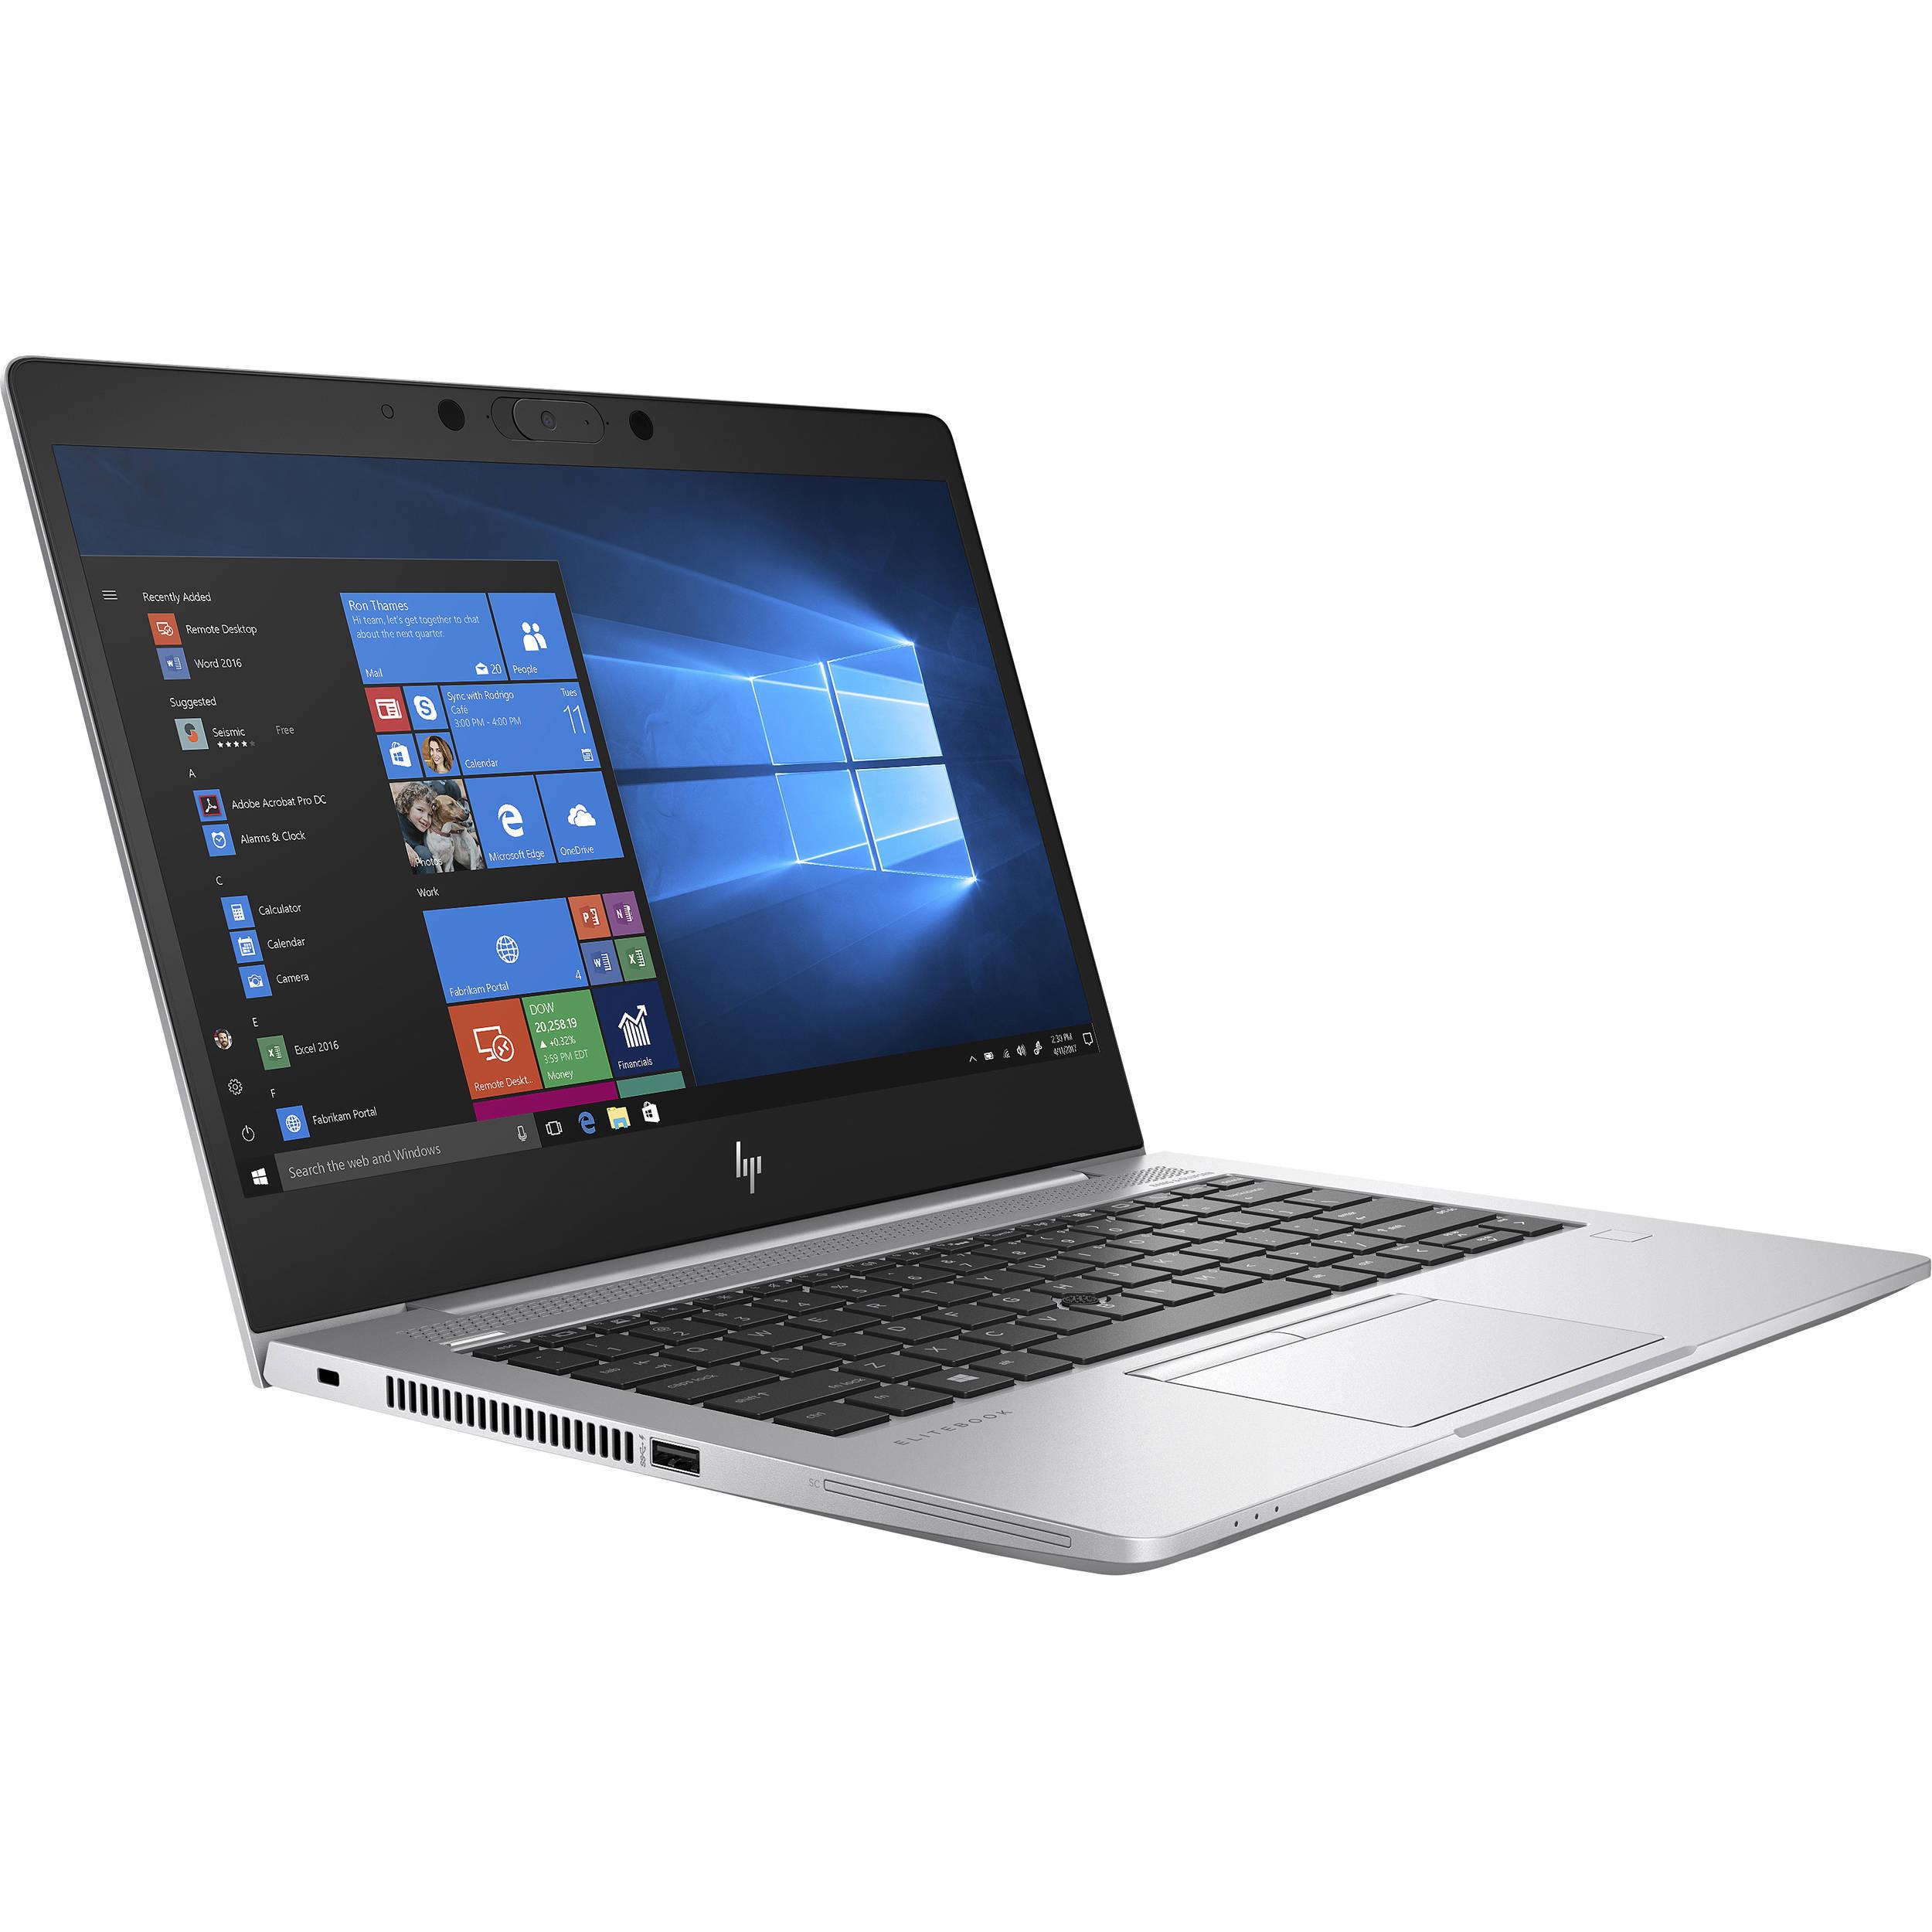 "HP 13.3"" EliteBook 735 G6 Laptop 7RR59UT#ABA B&H Photo"